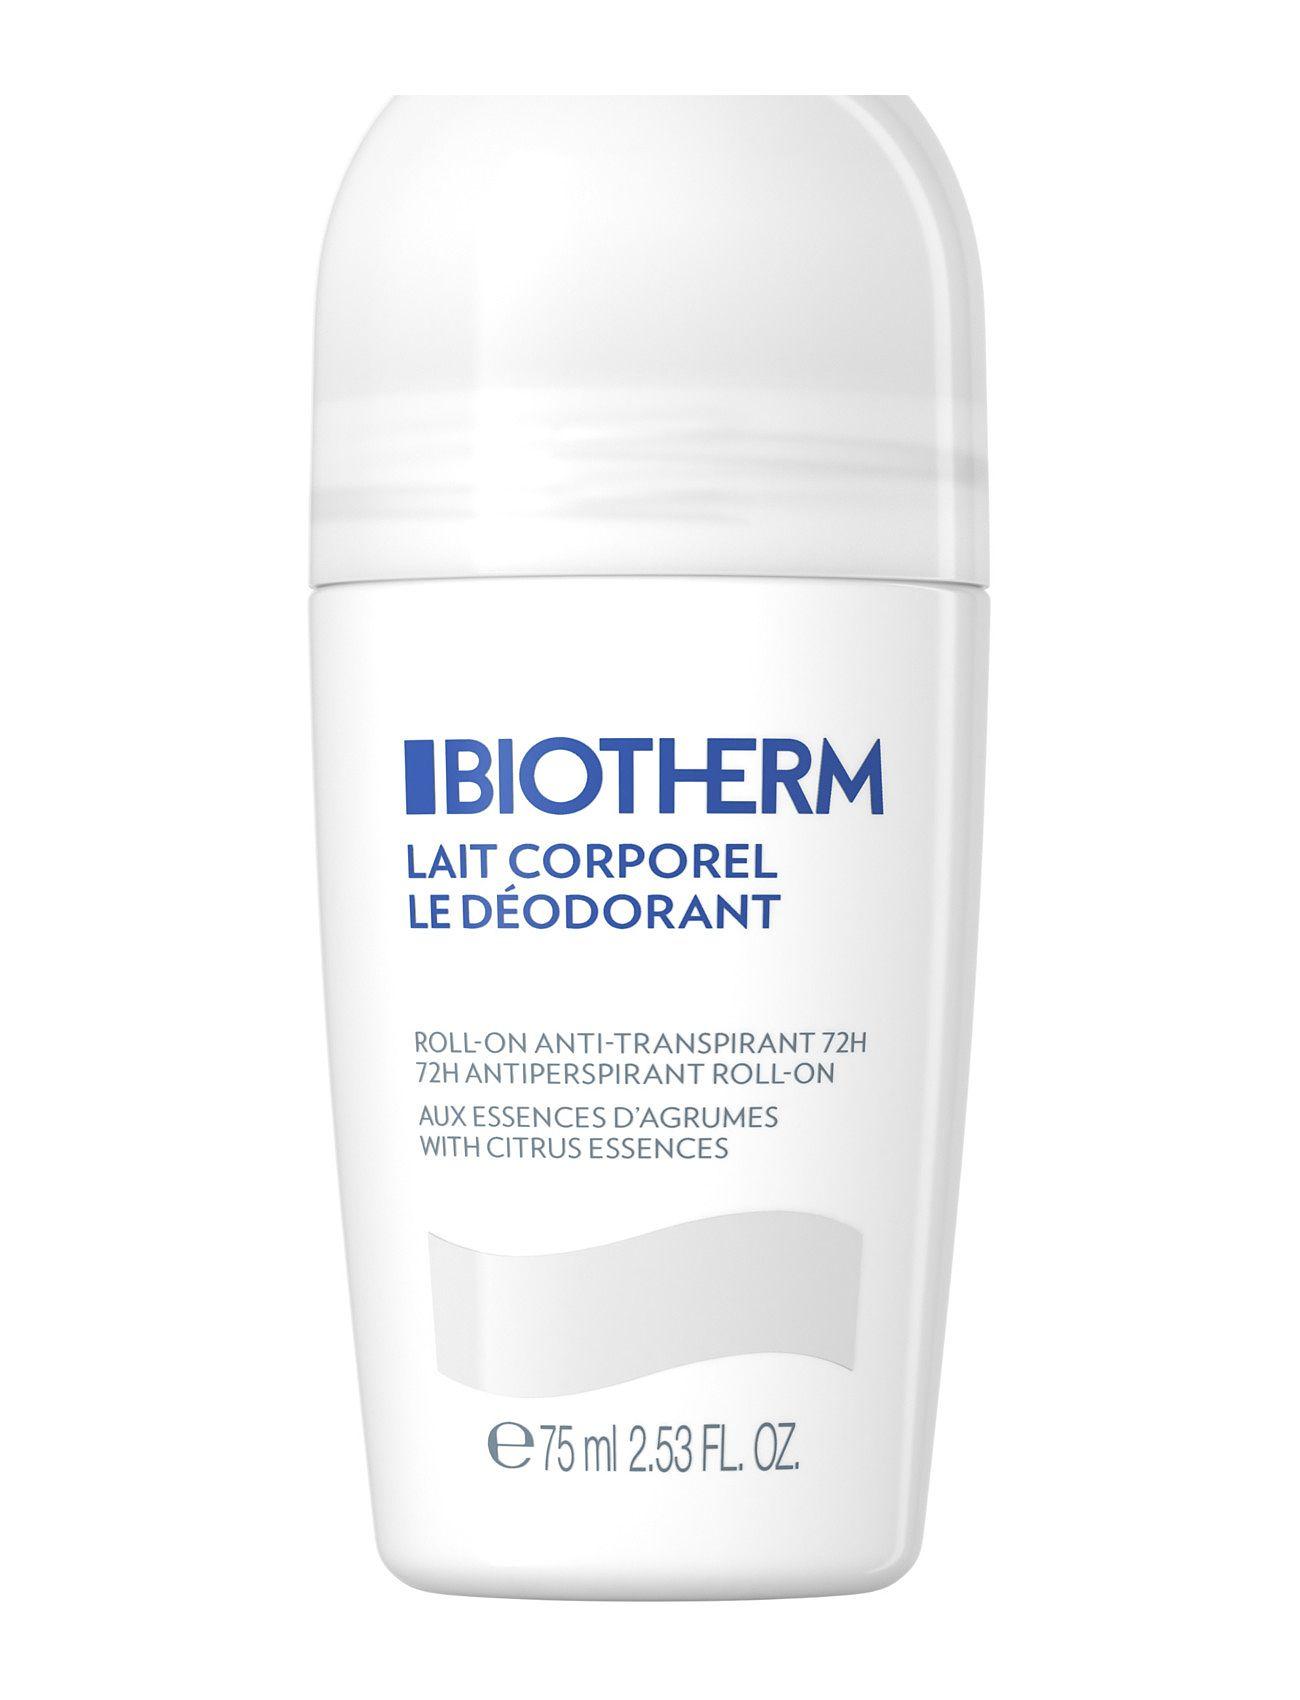 biotherm Lait corporel deo roll on 75 ml på boozt.com dk